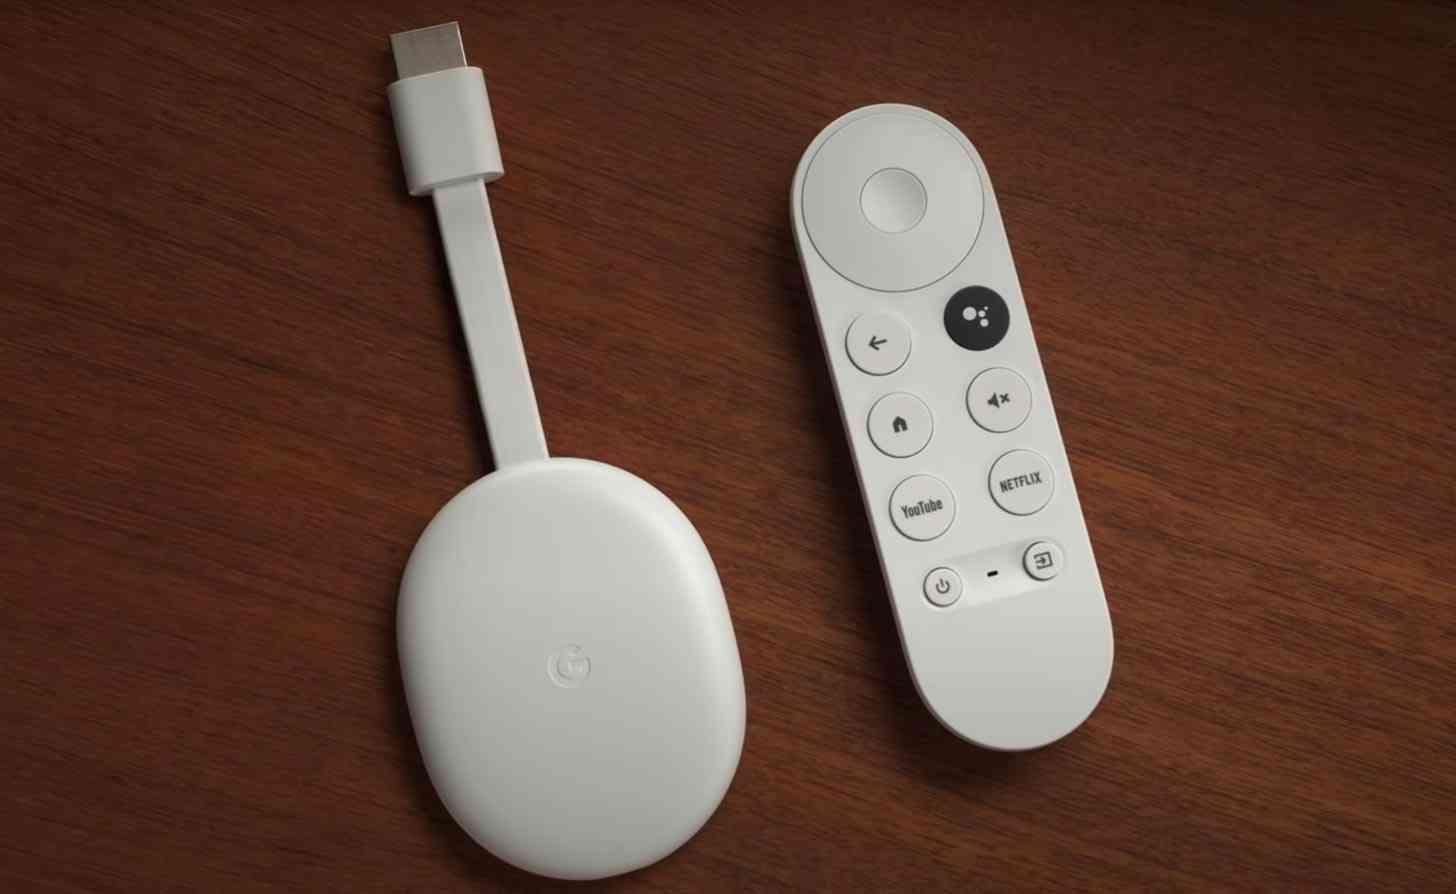 Chromecast with Google TV white